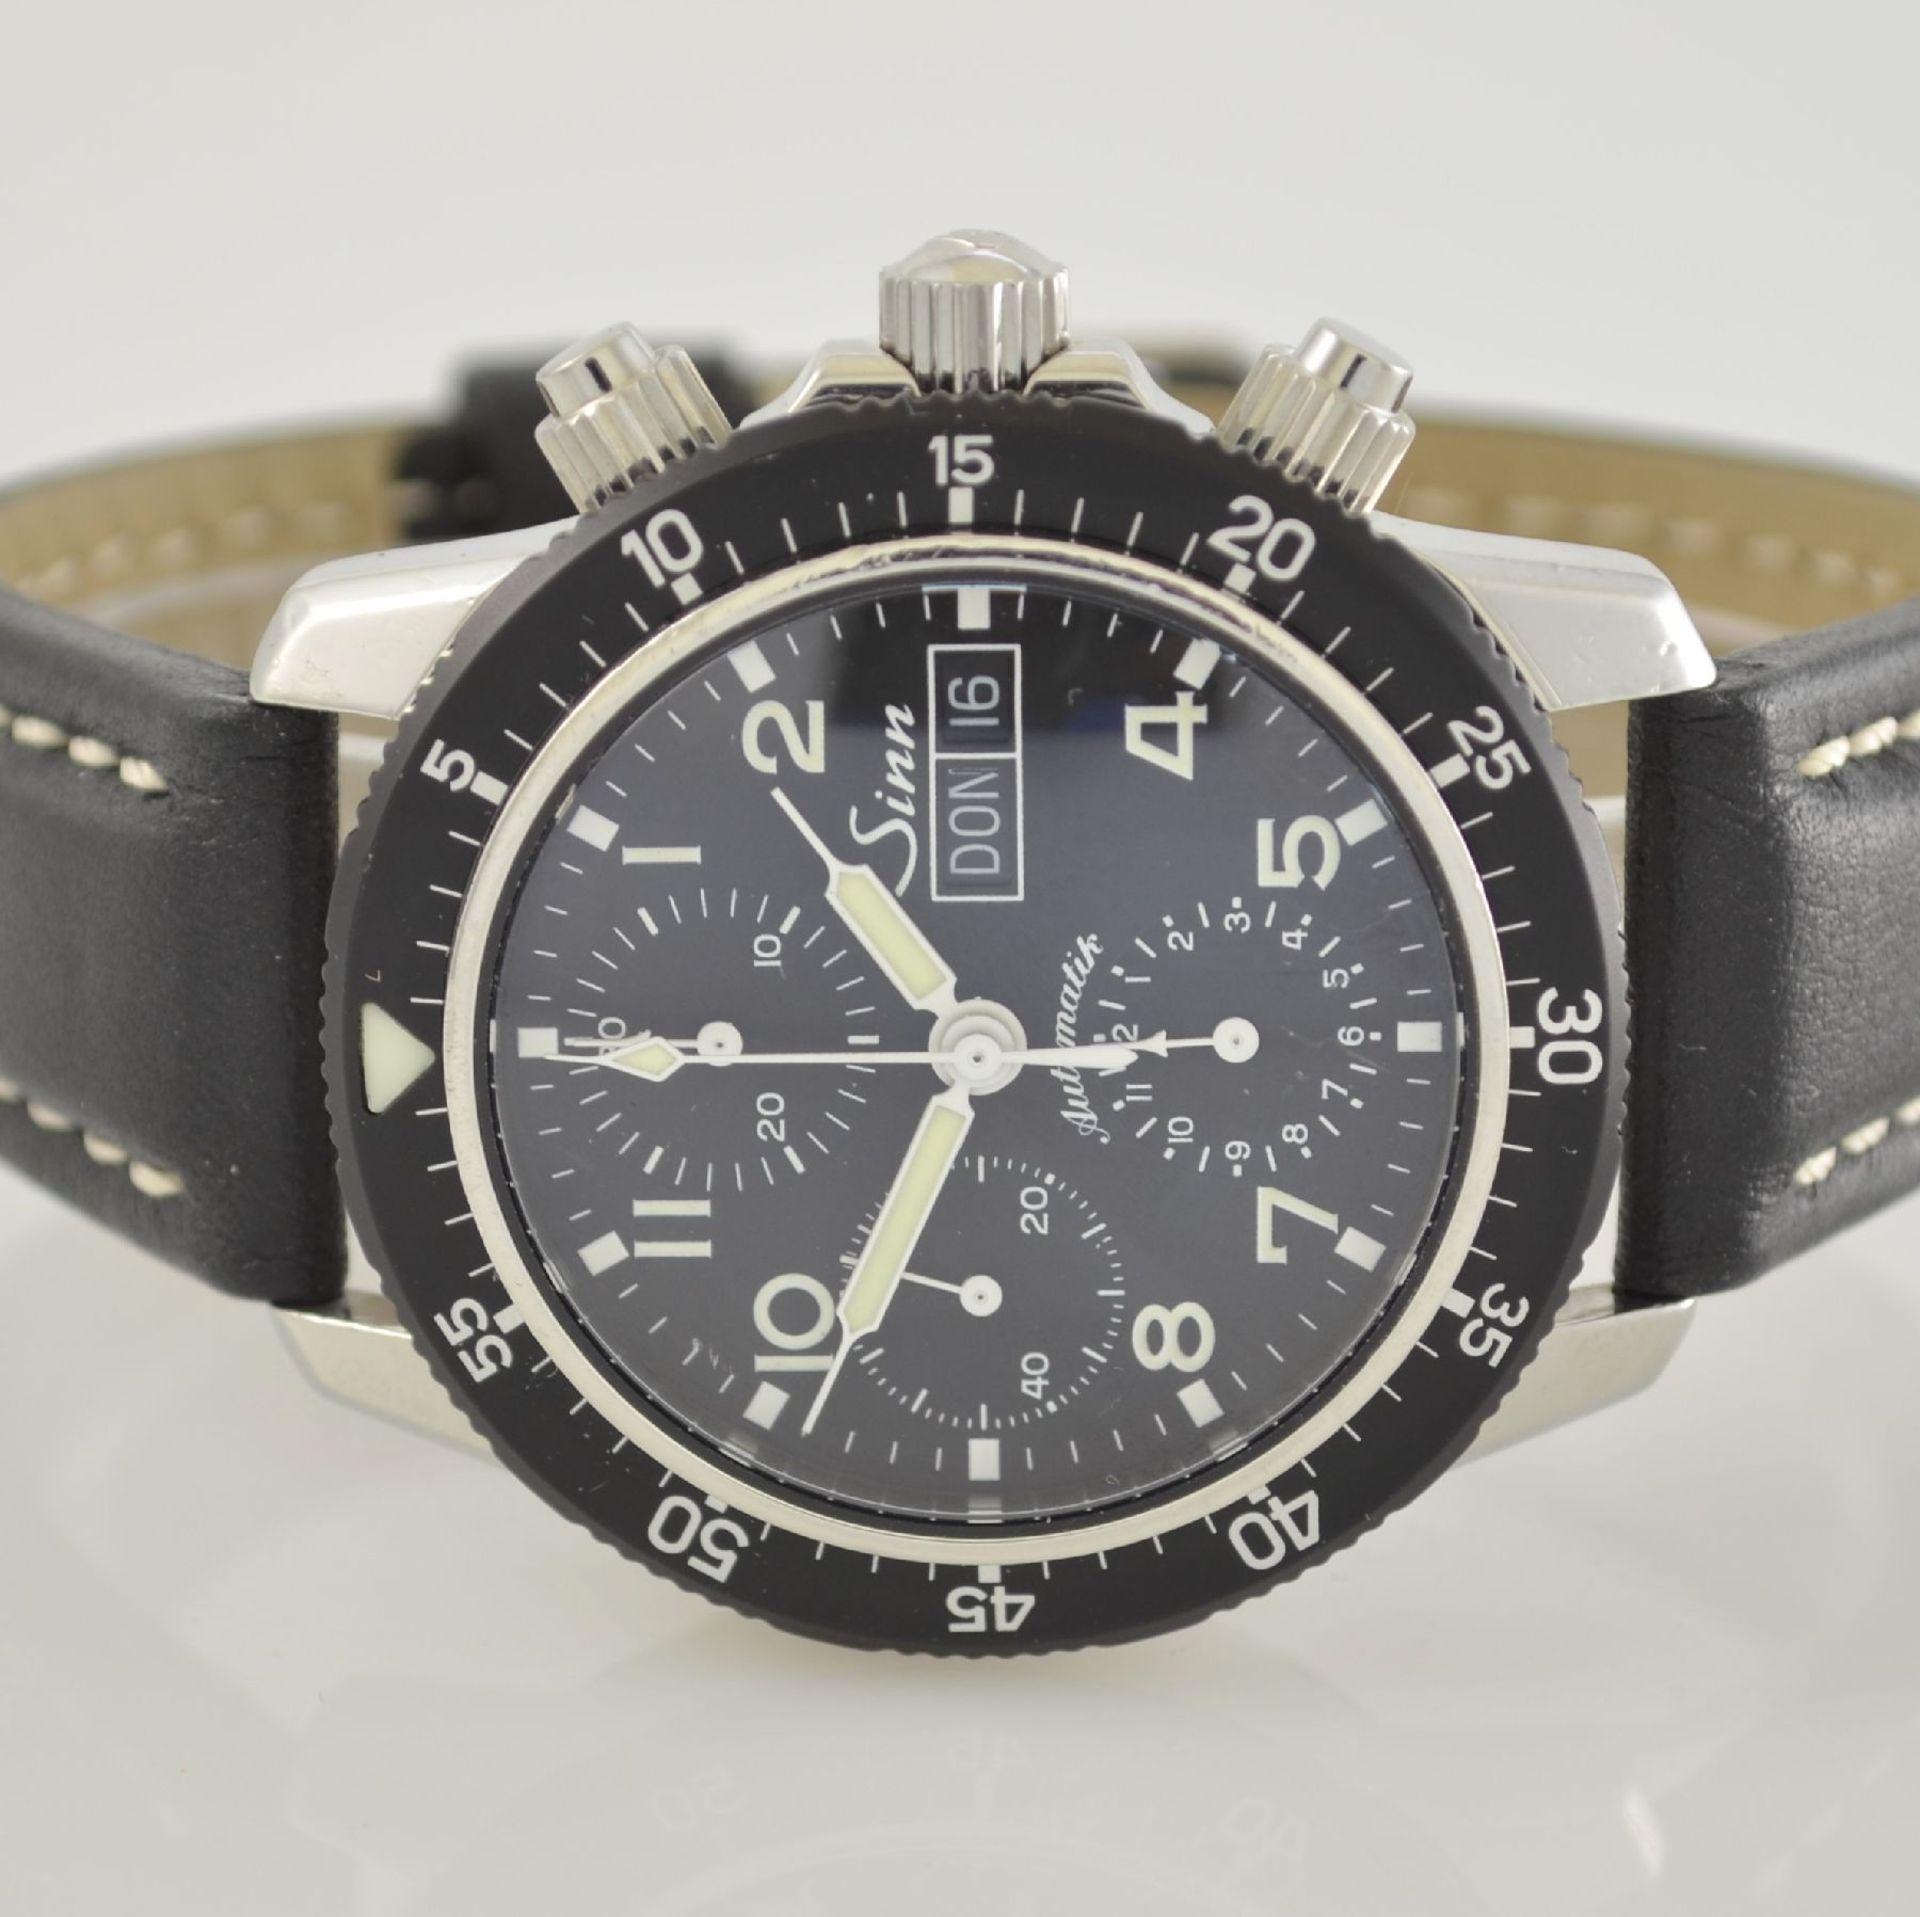 SINN Armbandchronograph, Automatik, Schweiz um 2010, pol. Edelstahlgeh. inkl. orig. Lederband m. - Bild 2 aus 6